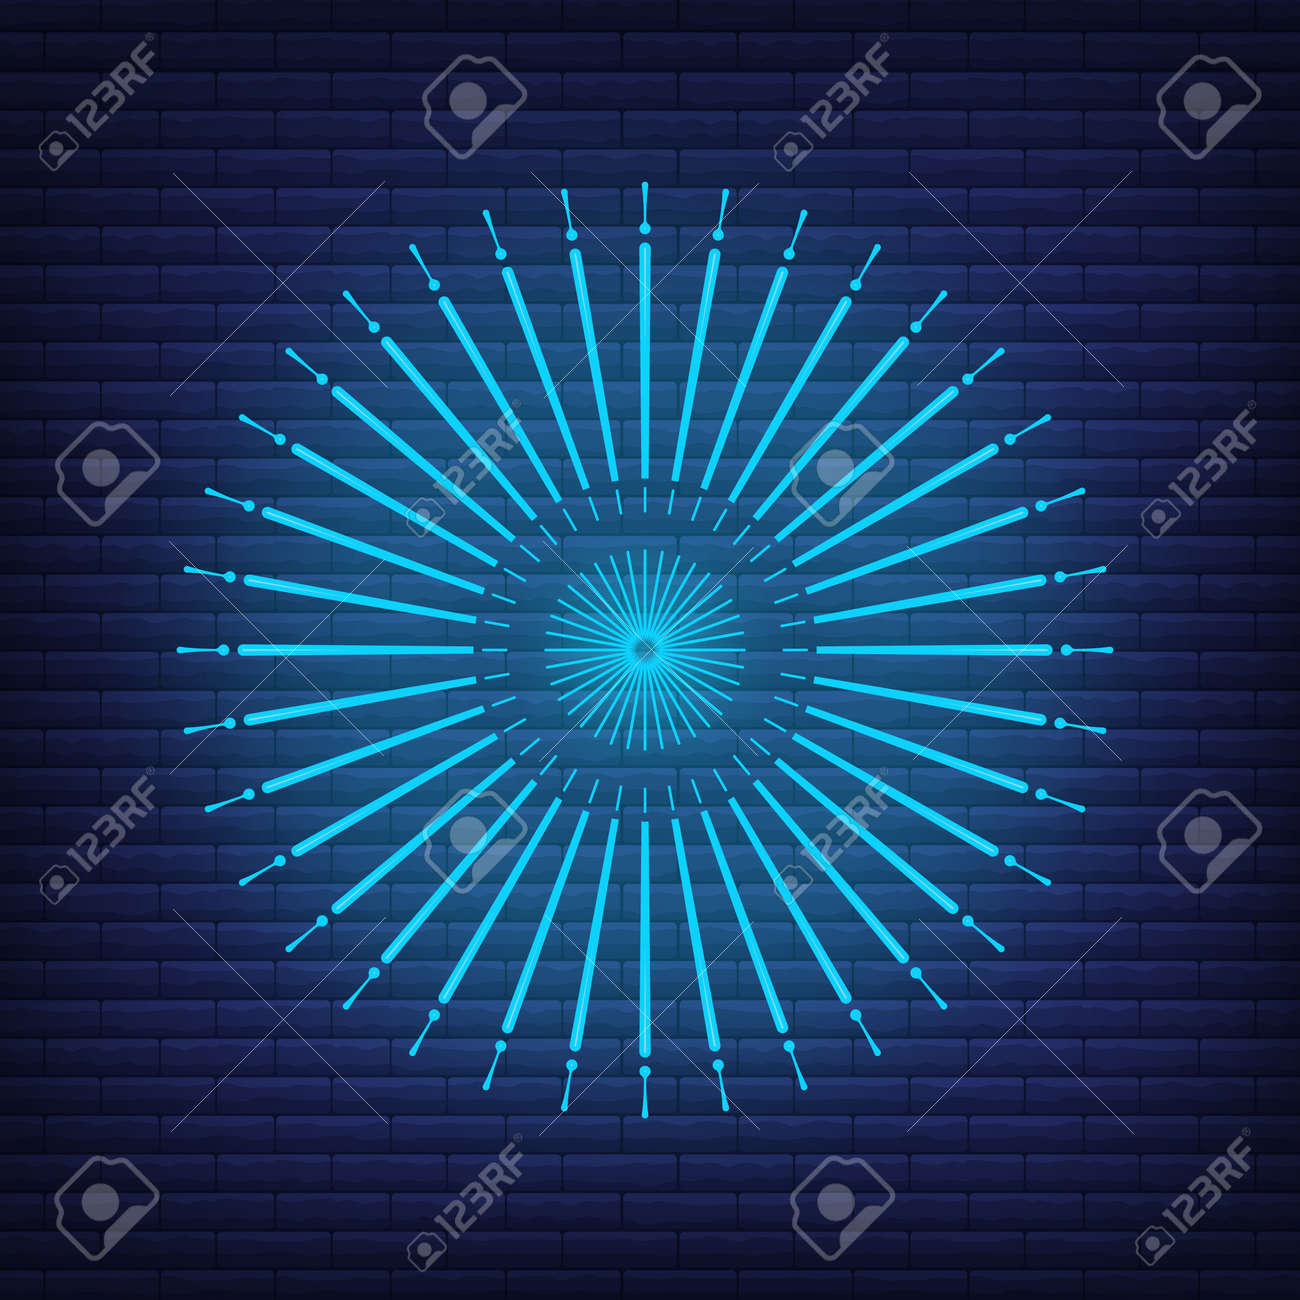 Retro design light sunburst neon style glow geometric shape, vintage rays sunlight explosion icon concept vector illustration, isolated on black wall. Minimal blue firework burst label, sunbeam badge. - 168394795